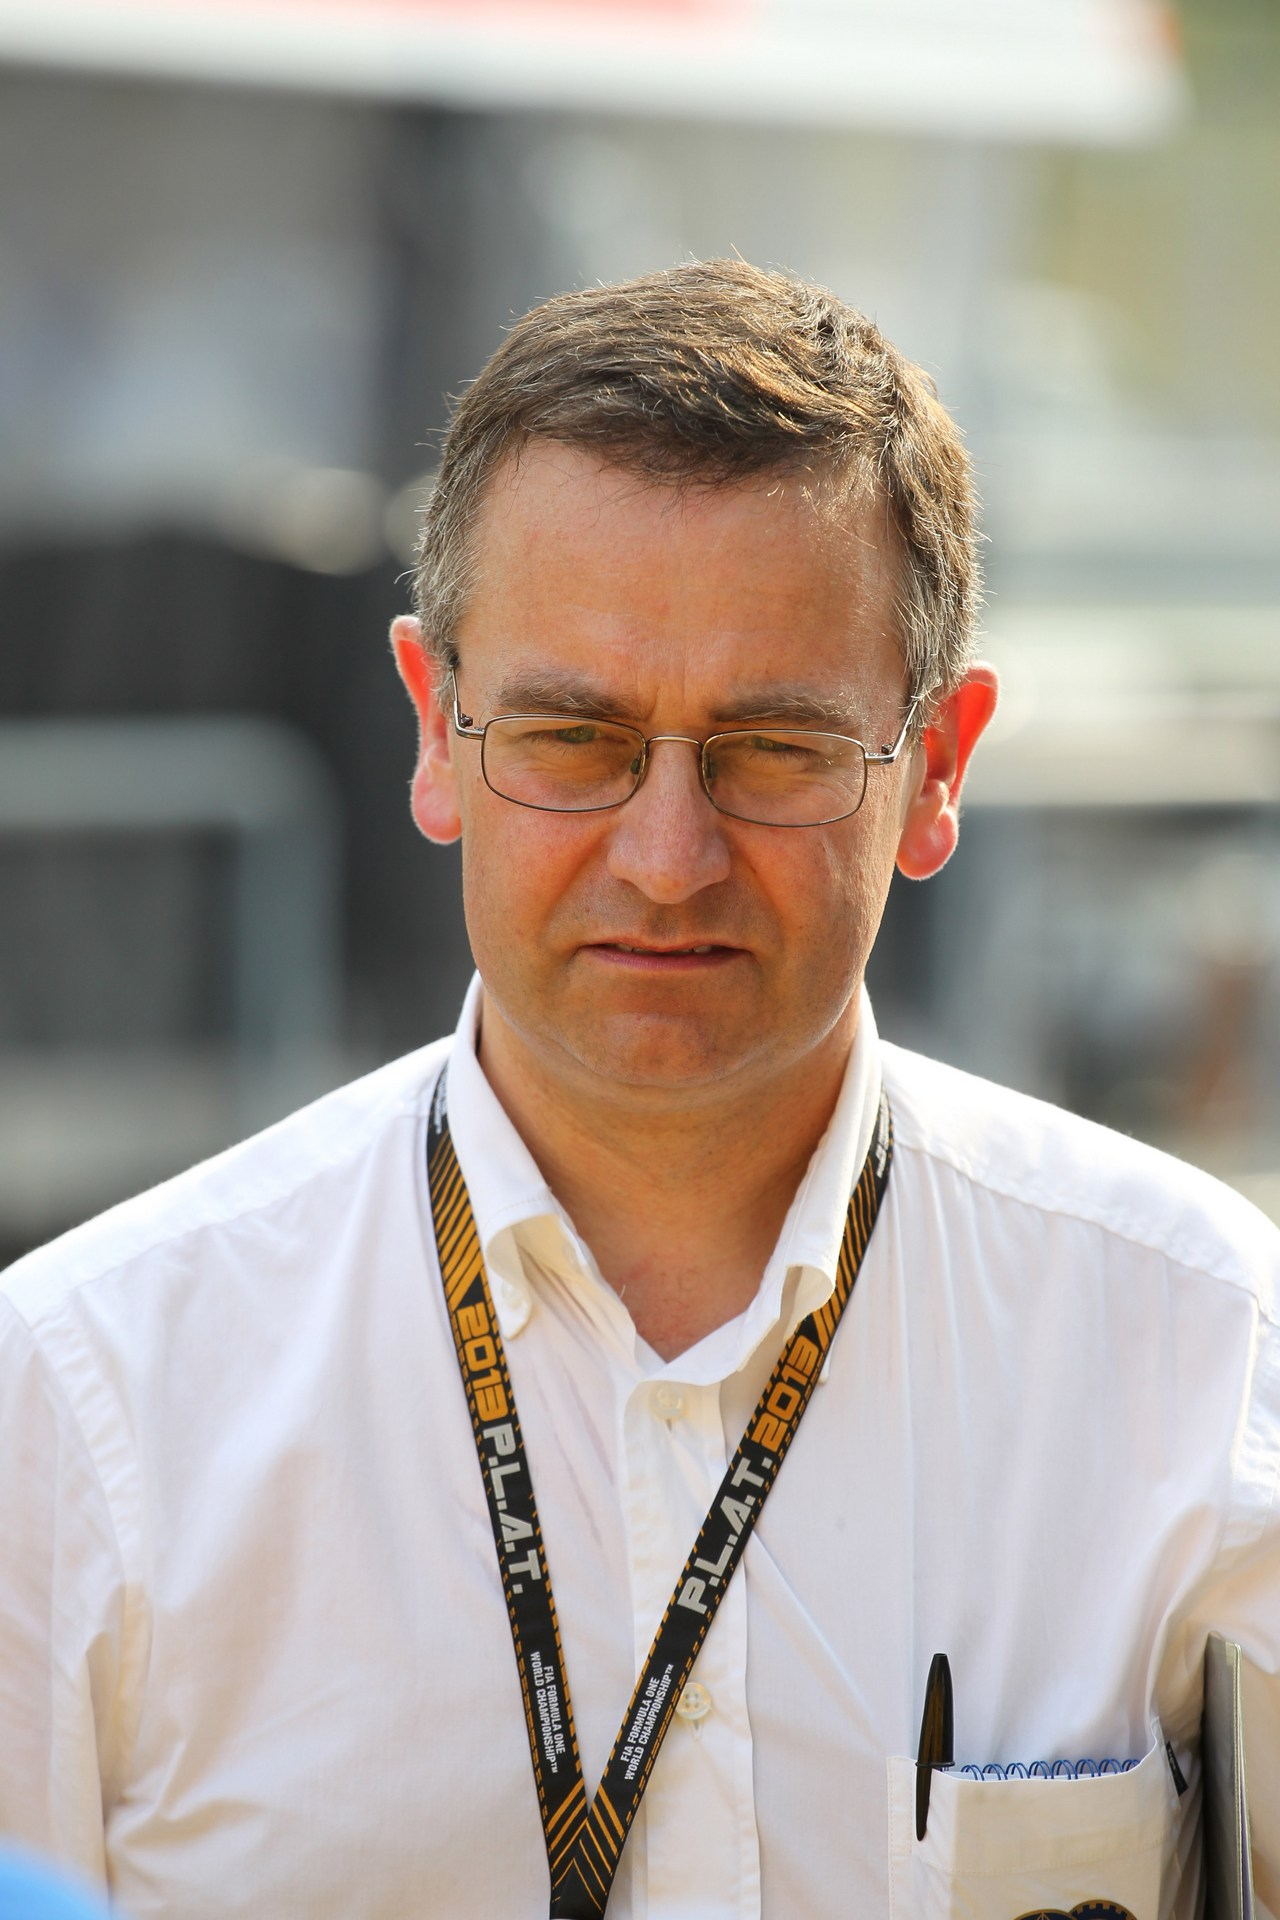 21.03.2013- Dr. Ian Roberts (GBR) FIA Doctor